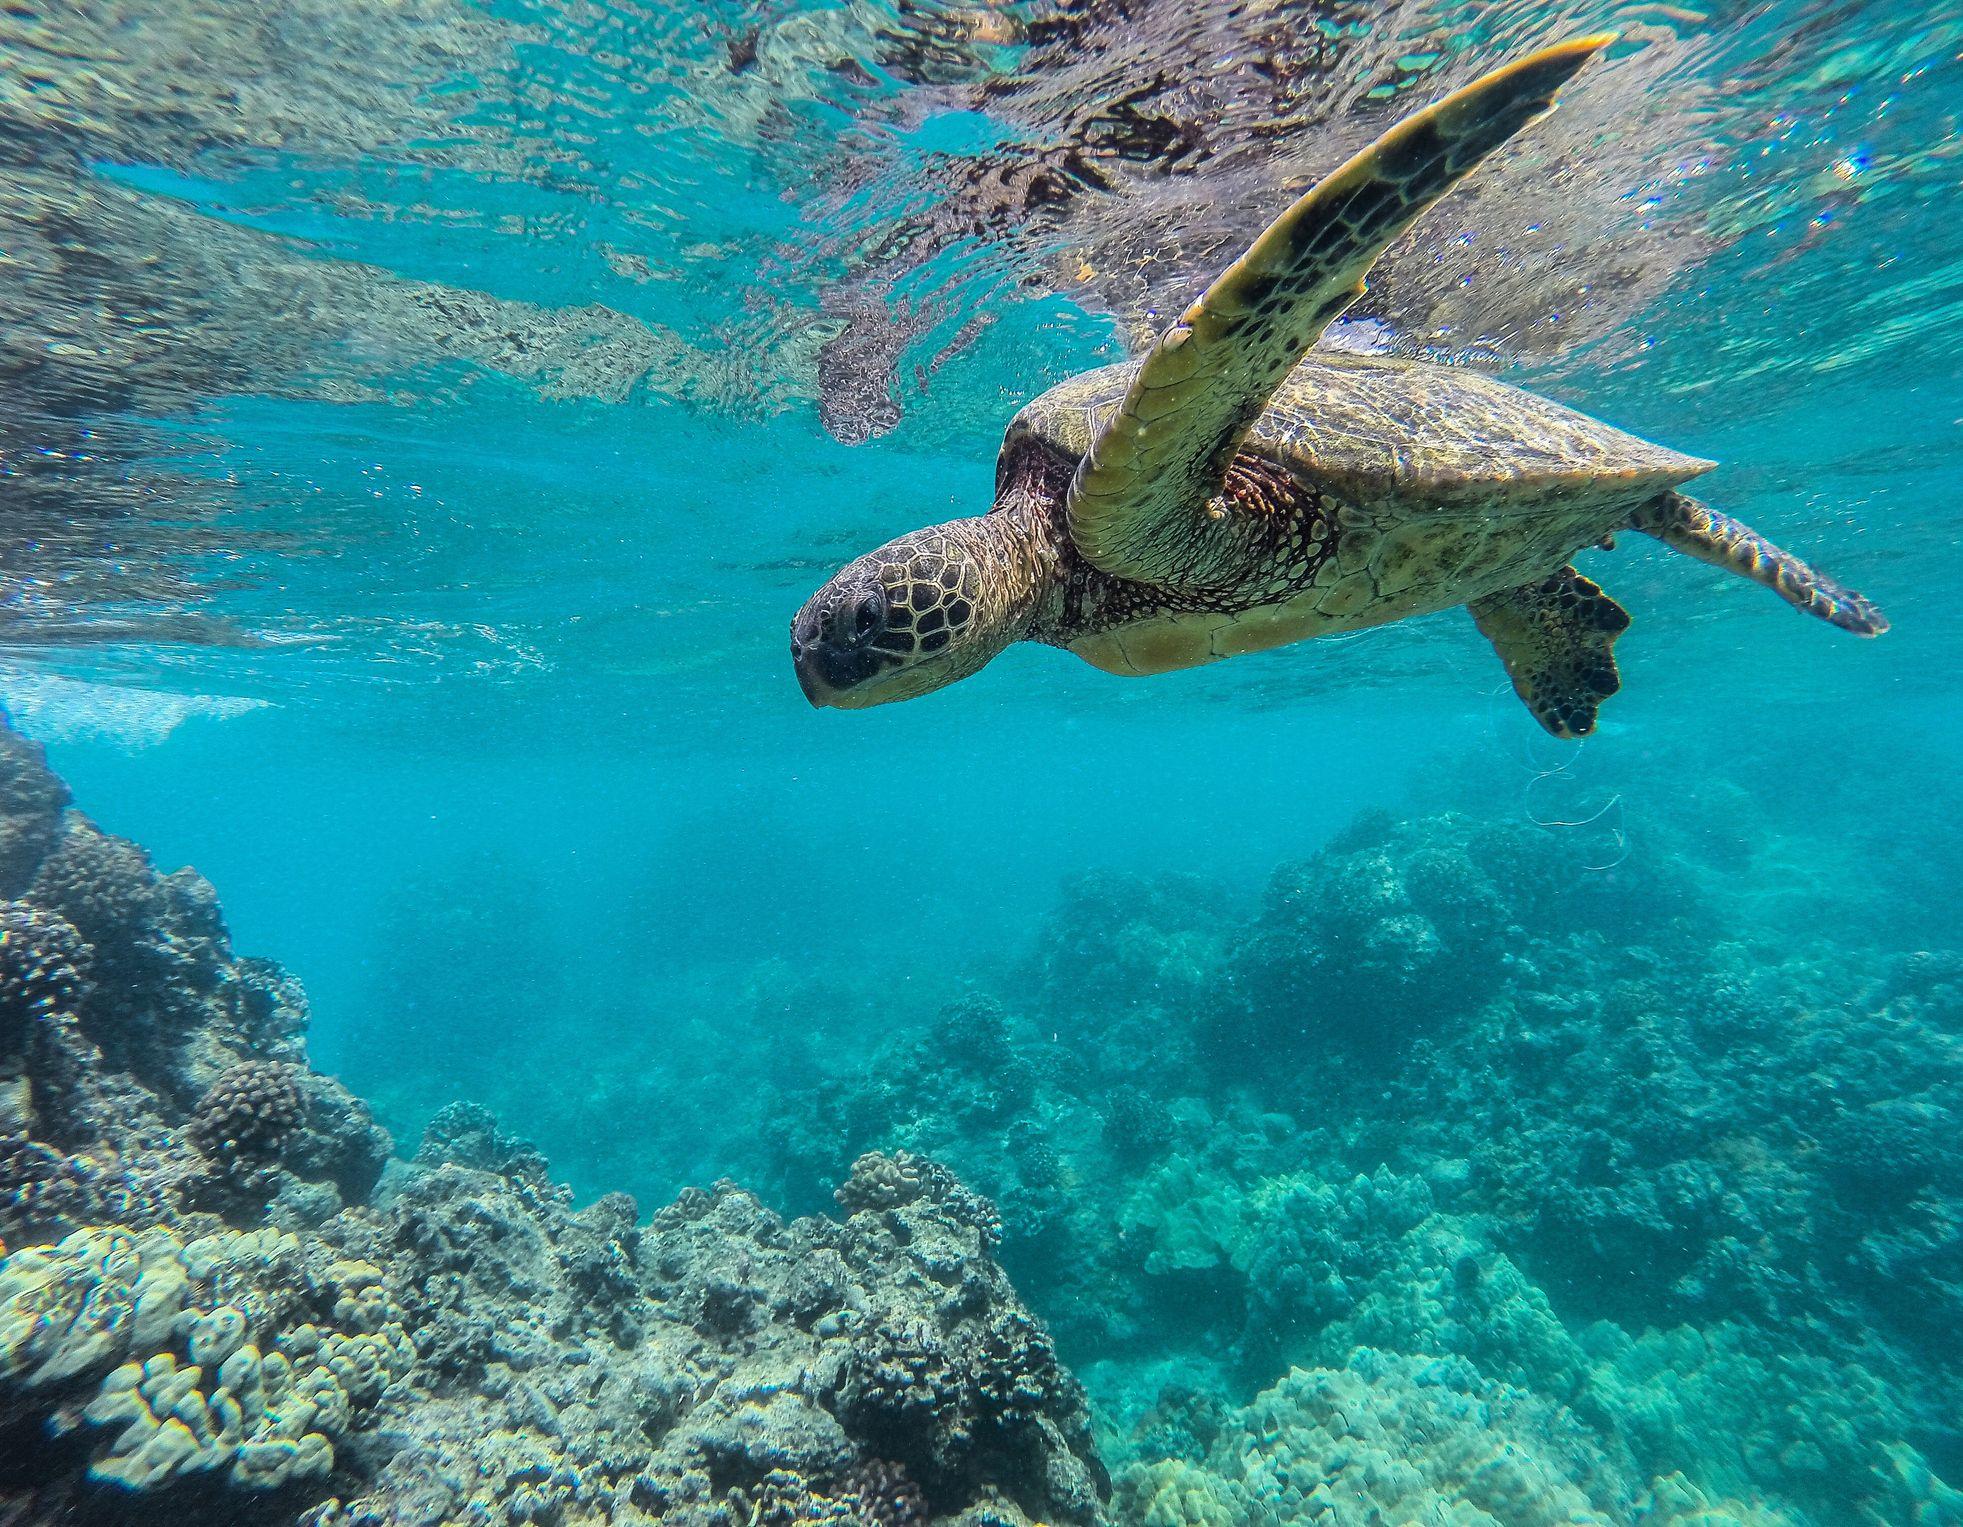 Grande tortue de mer sous l'eau